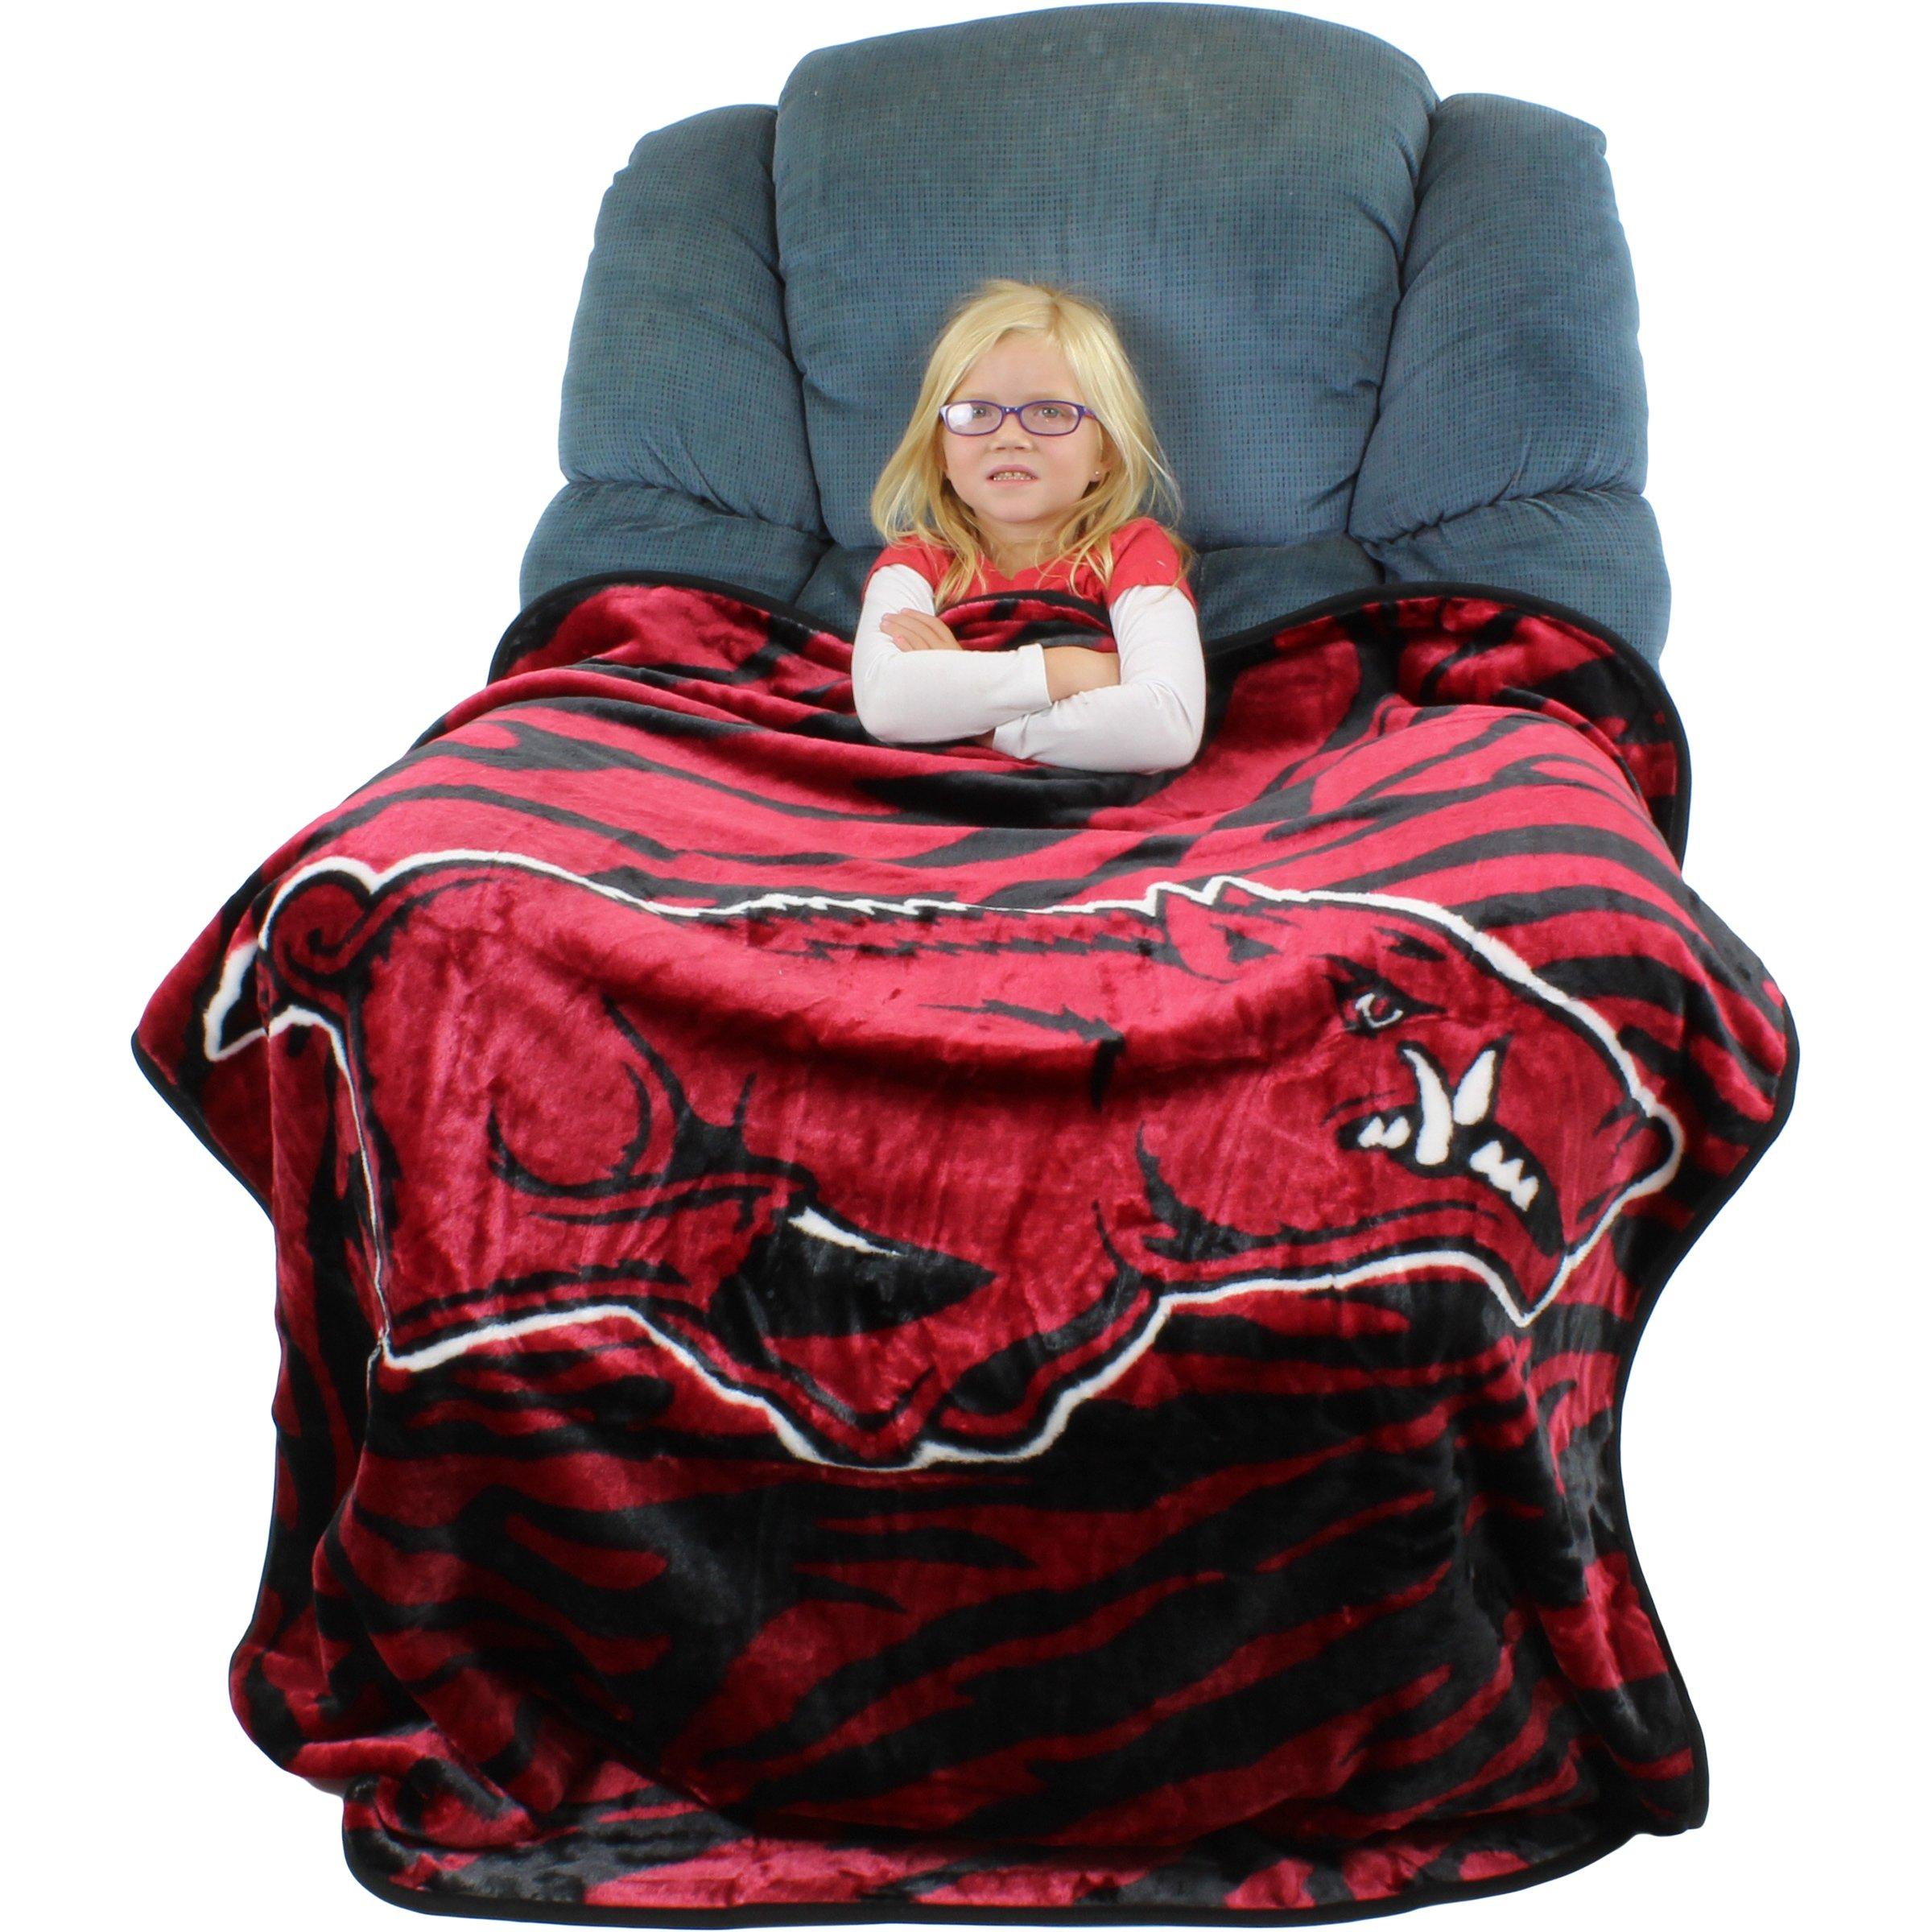 "College Covers Arkansas Razorbacks Raschel Throw Blanket, 50"" x 60"""